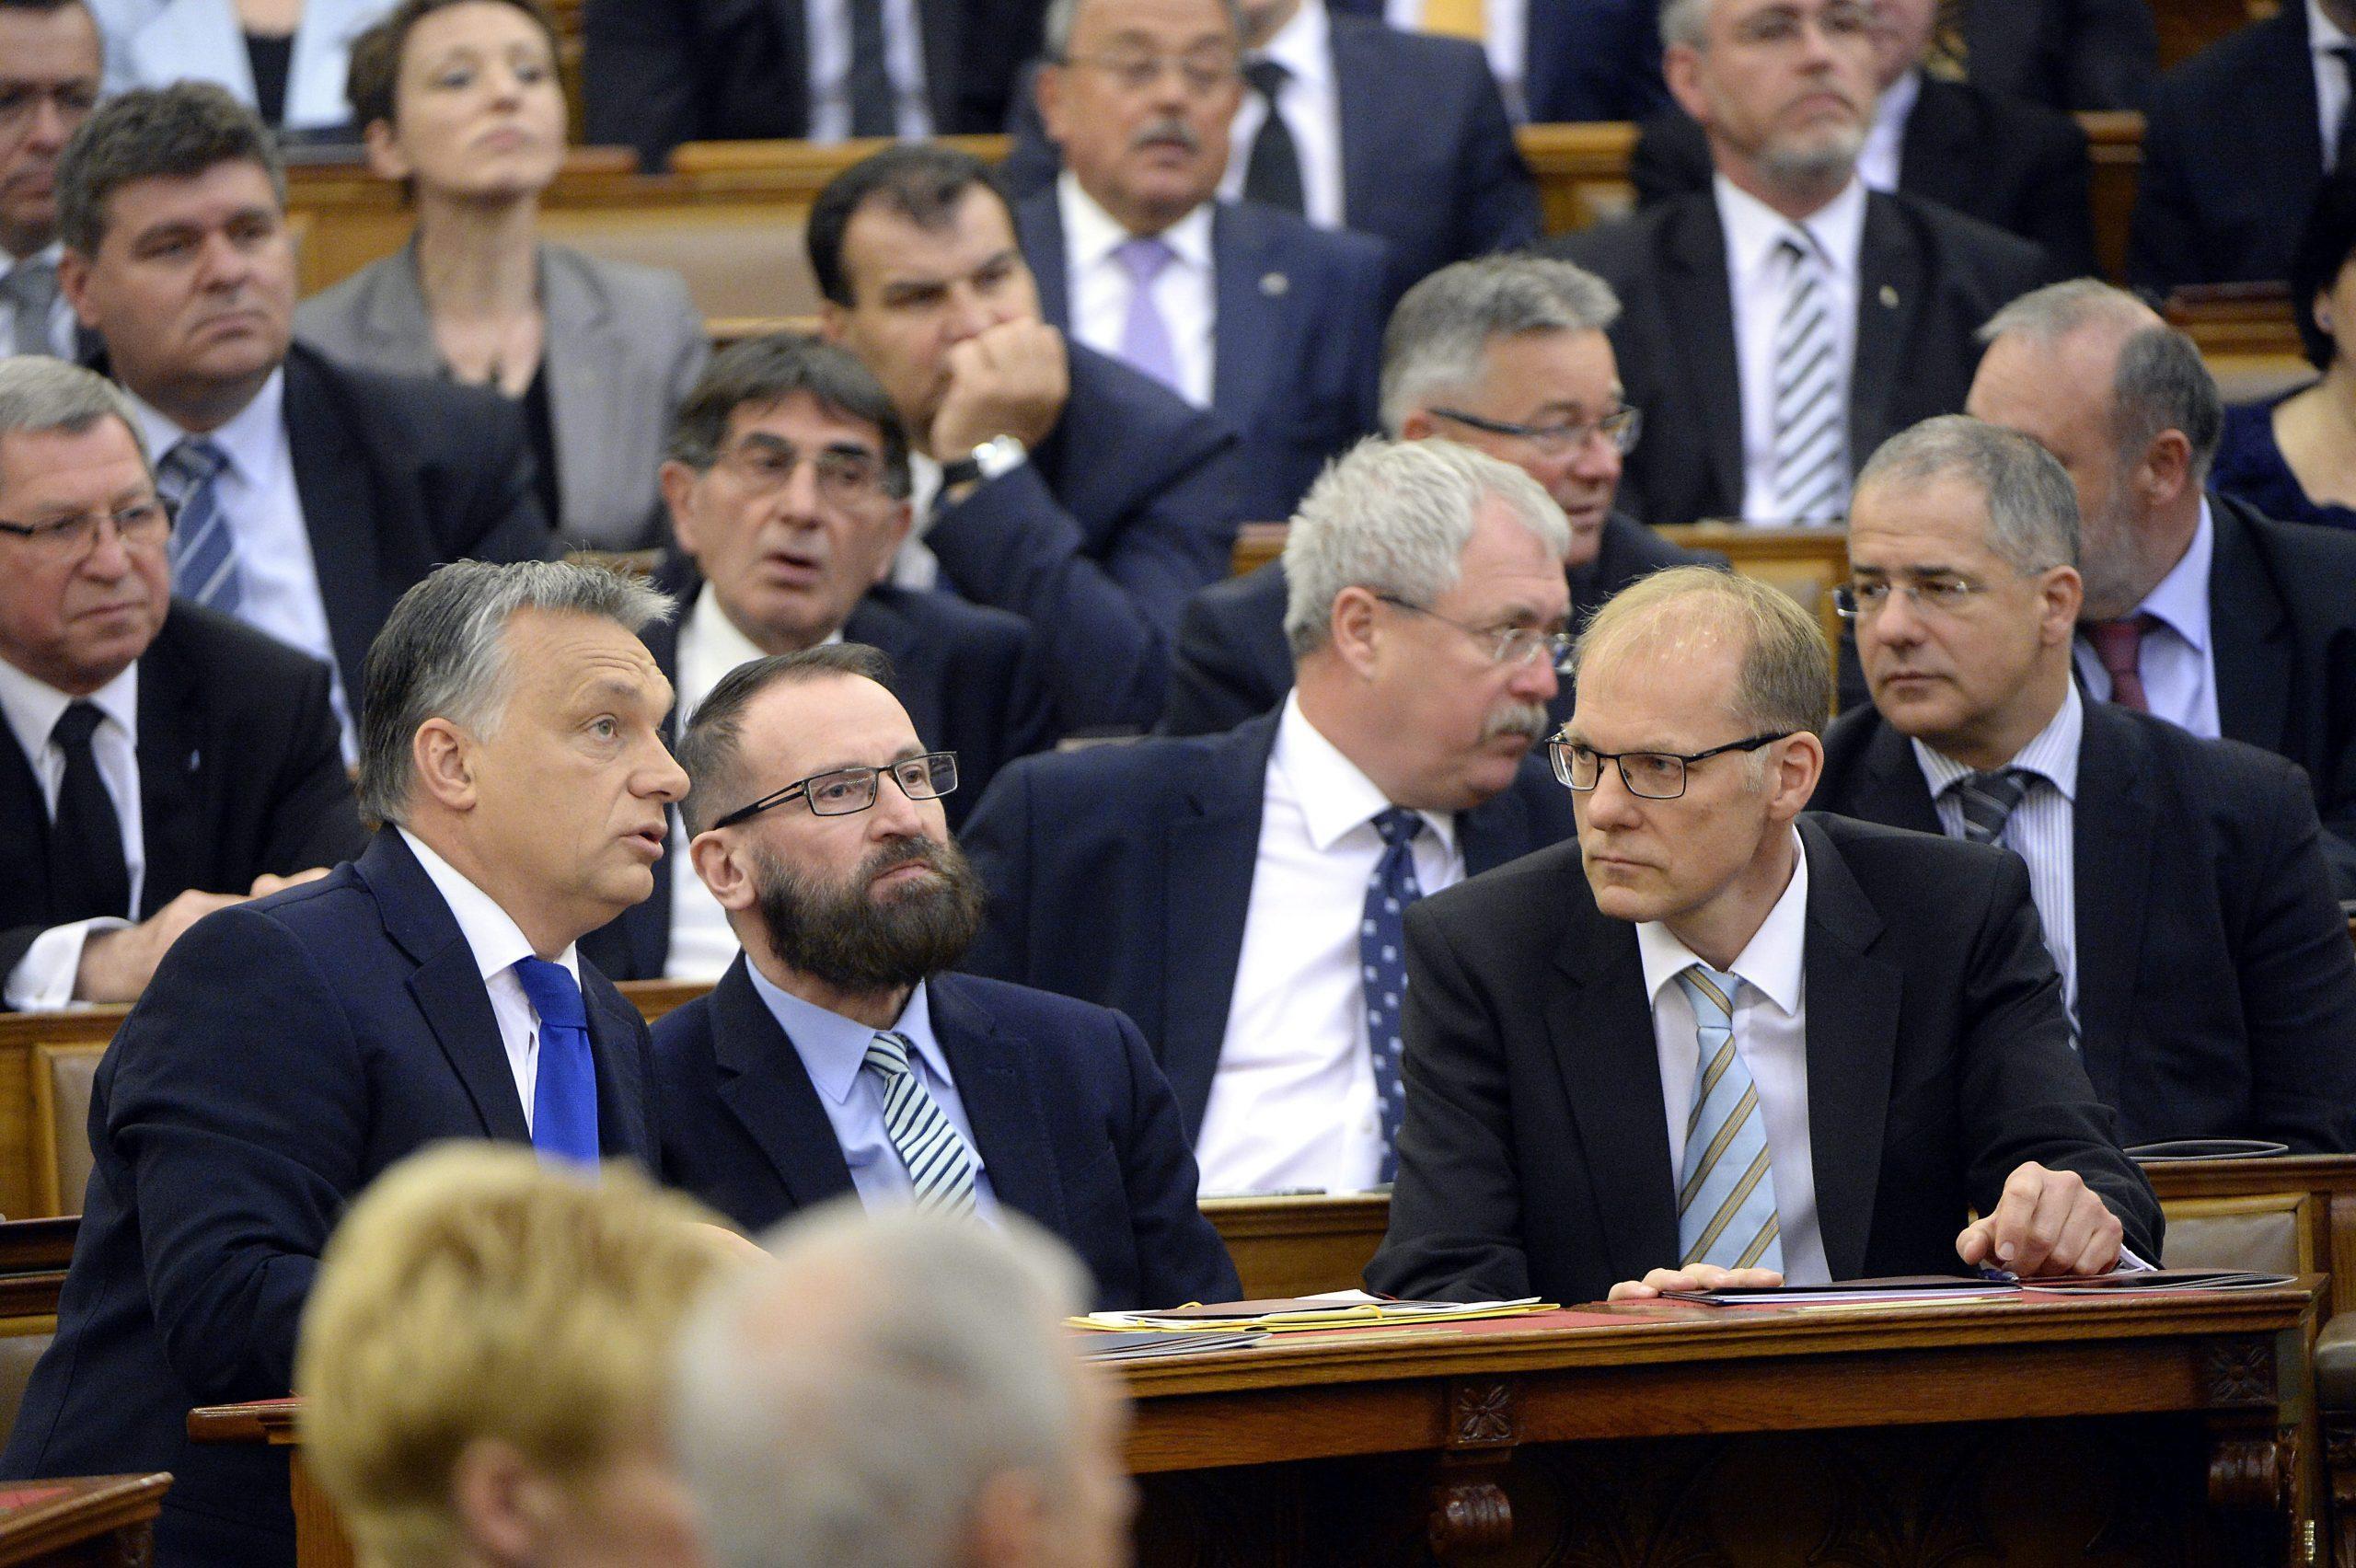 Szájer tritt aus der Partei aus, Orbán äußert sich zu Skandal